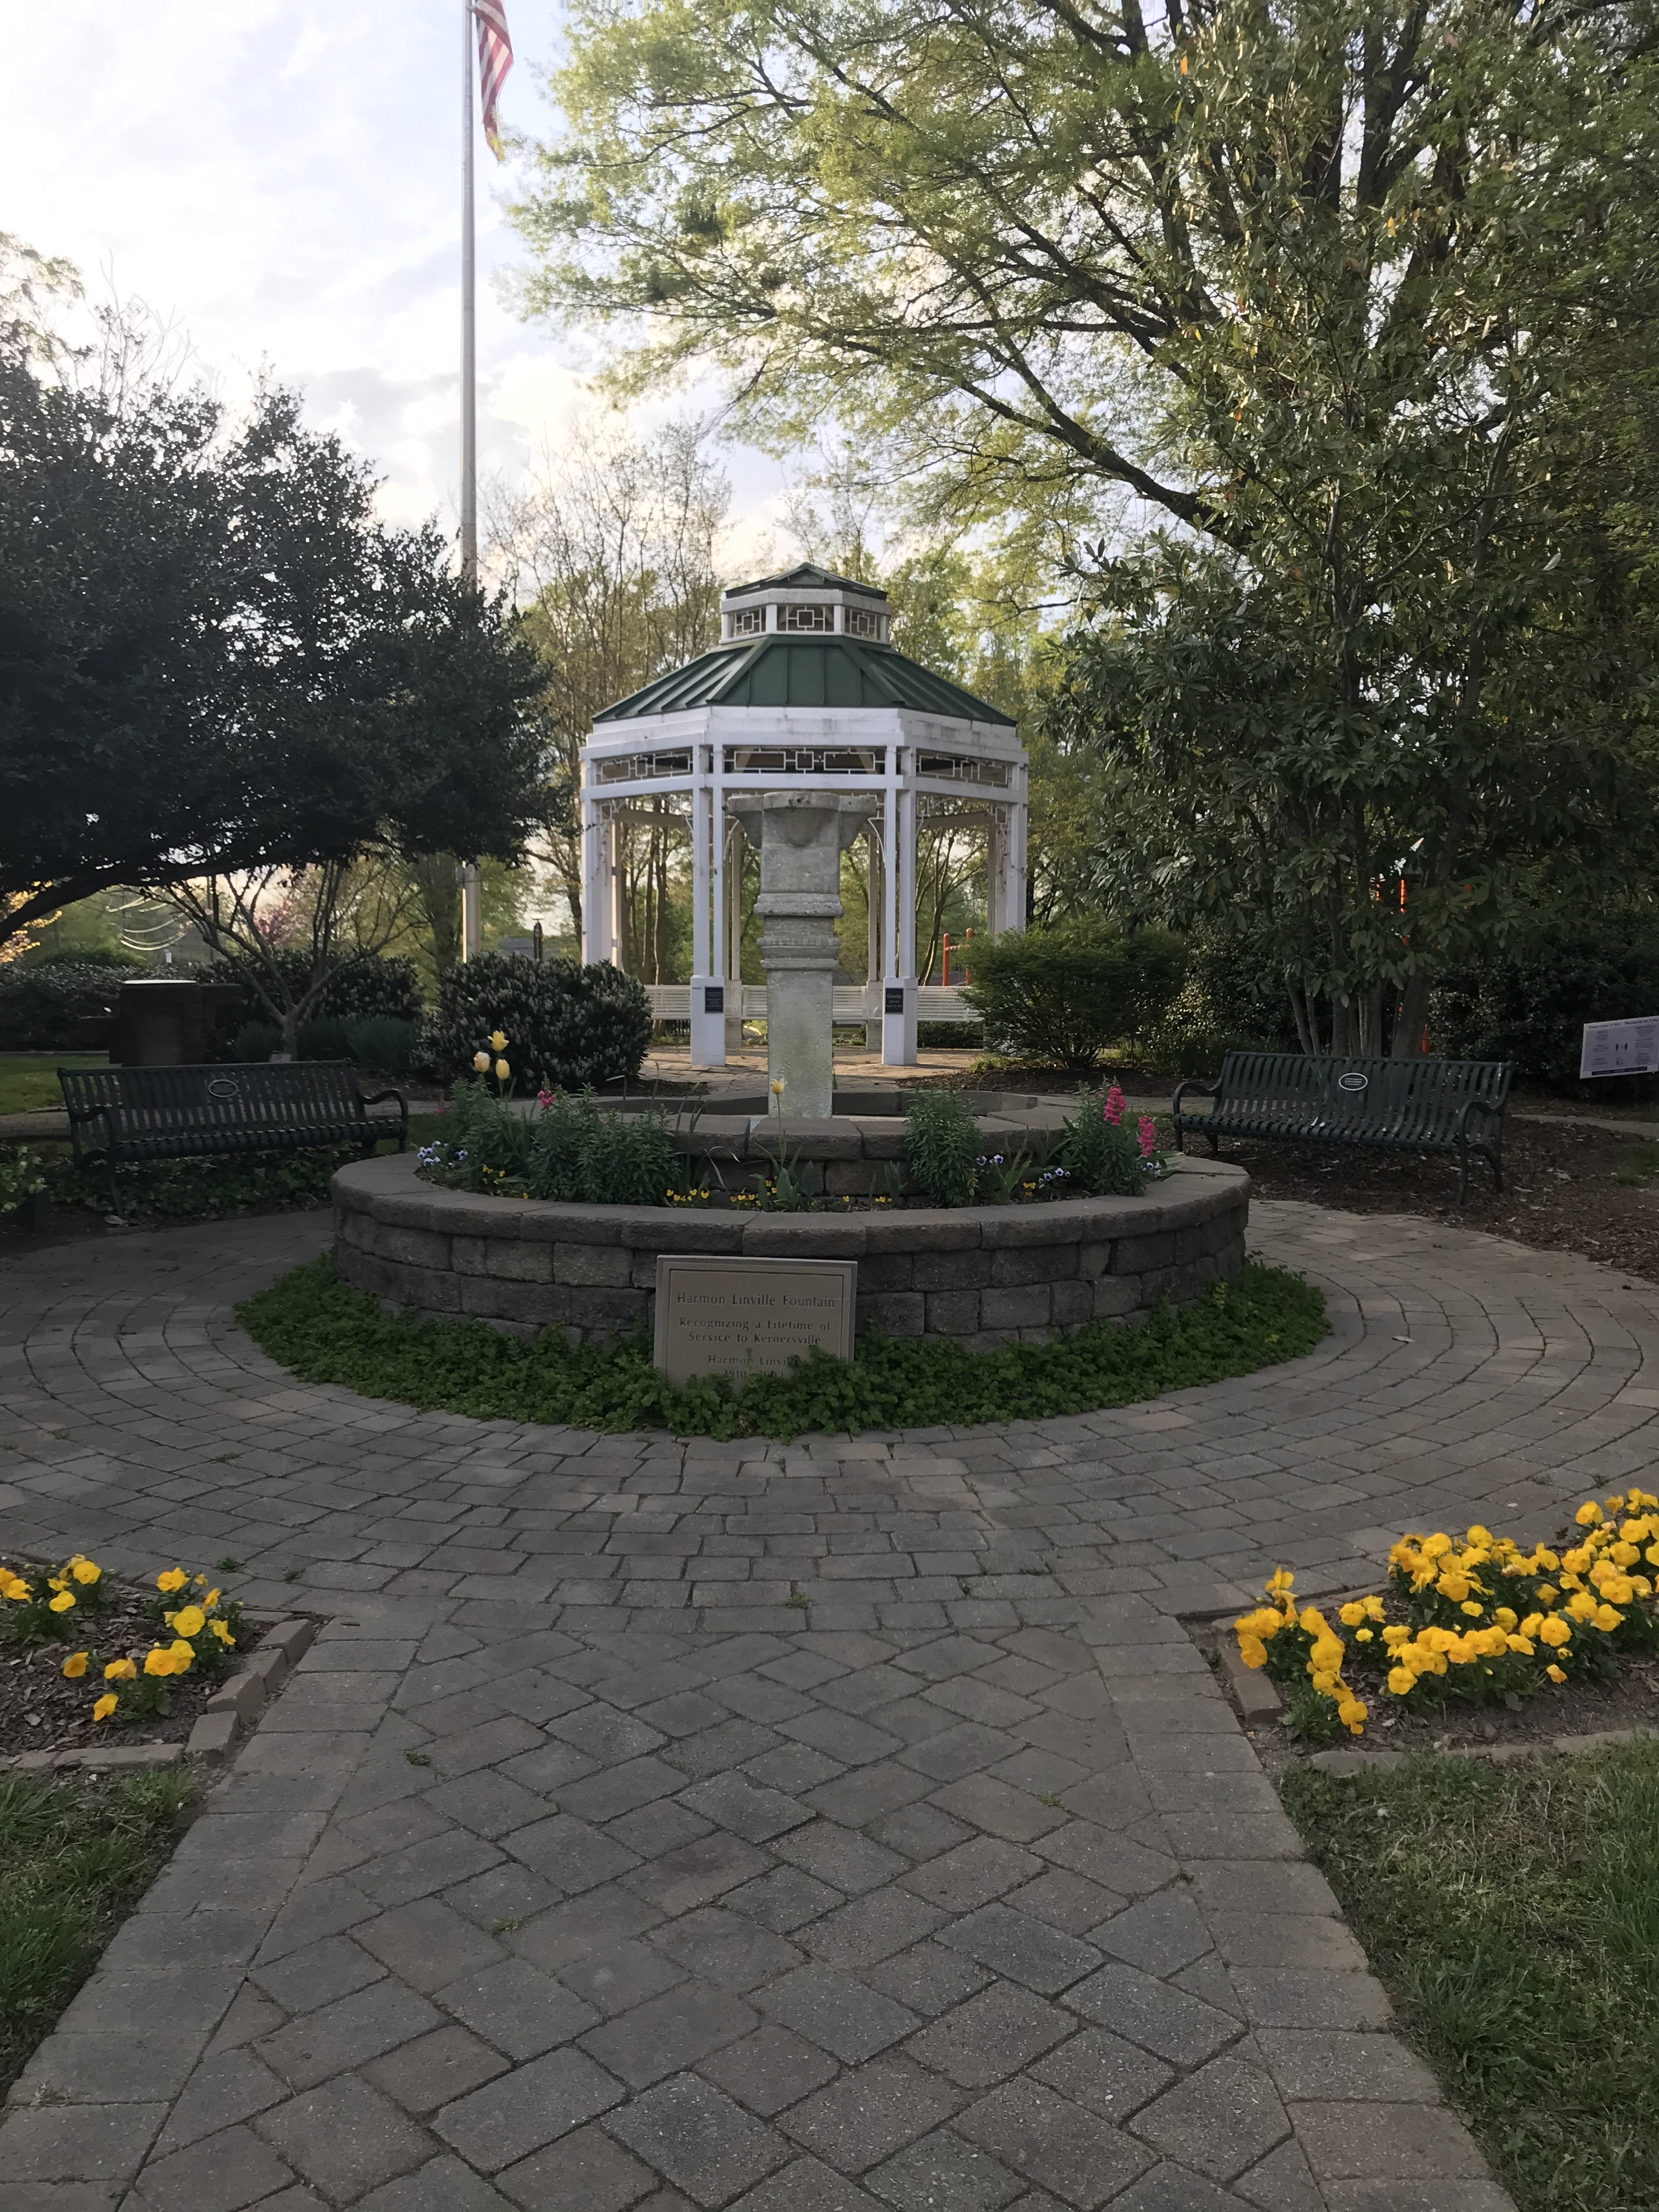 Local spring Destinations